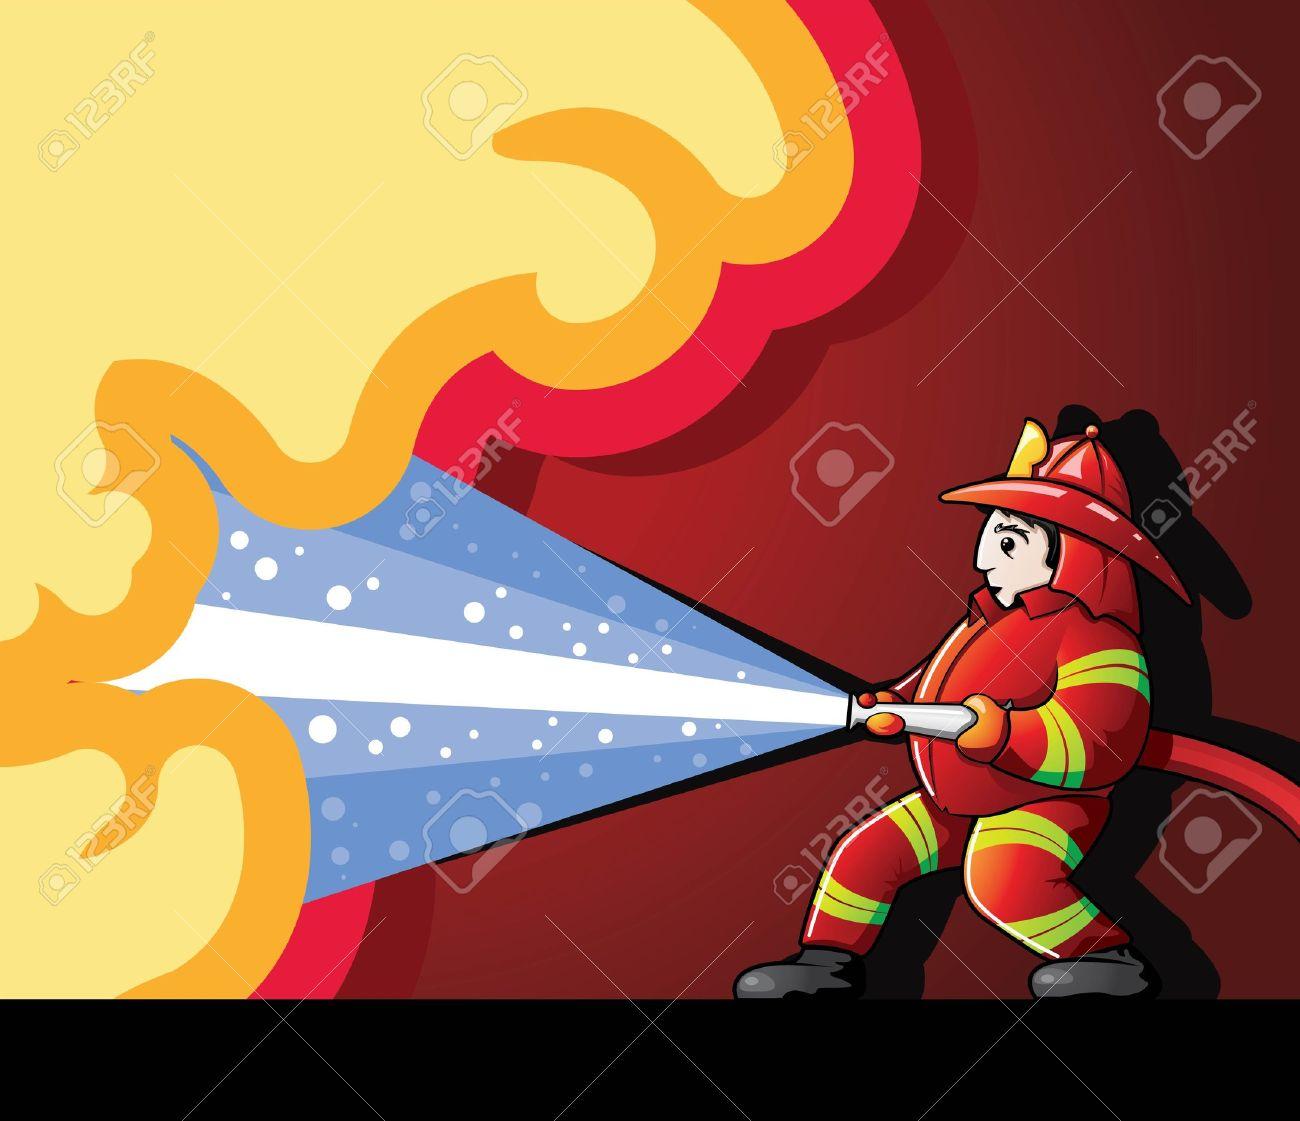 Firefighter Fighting Fire Stock Vector - 20140923